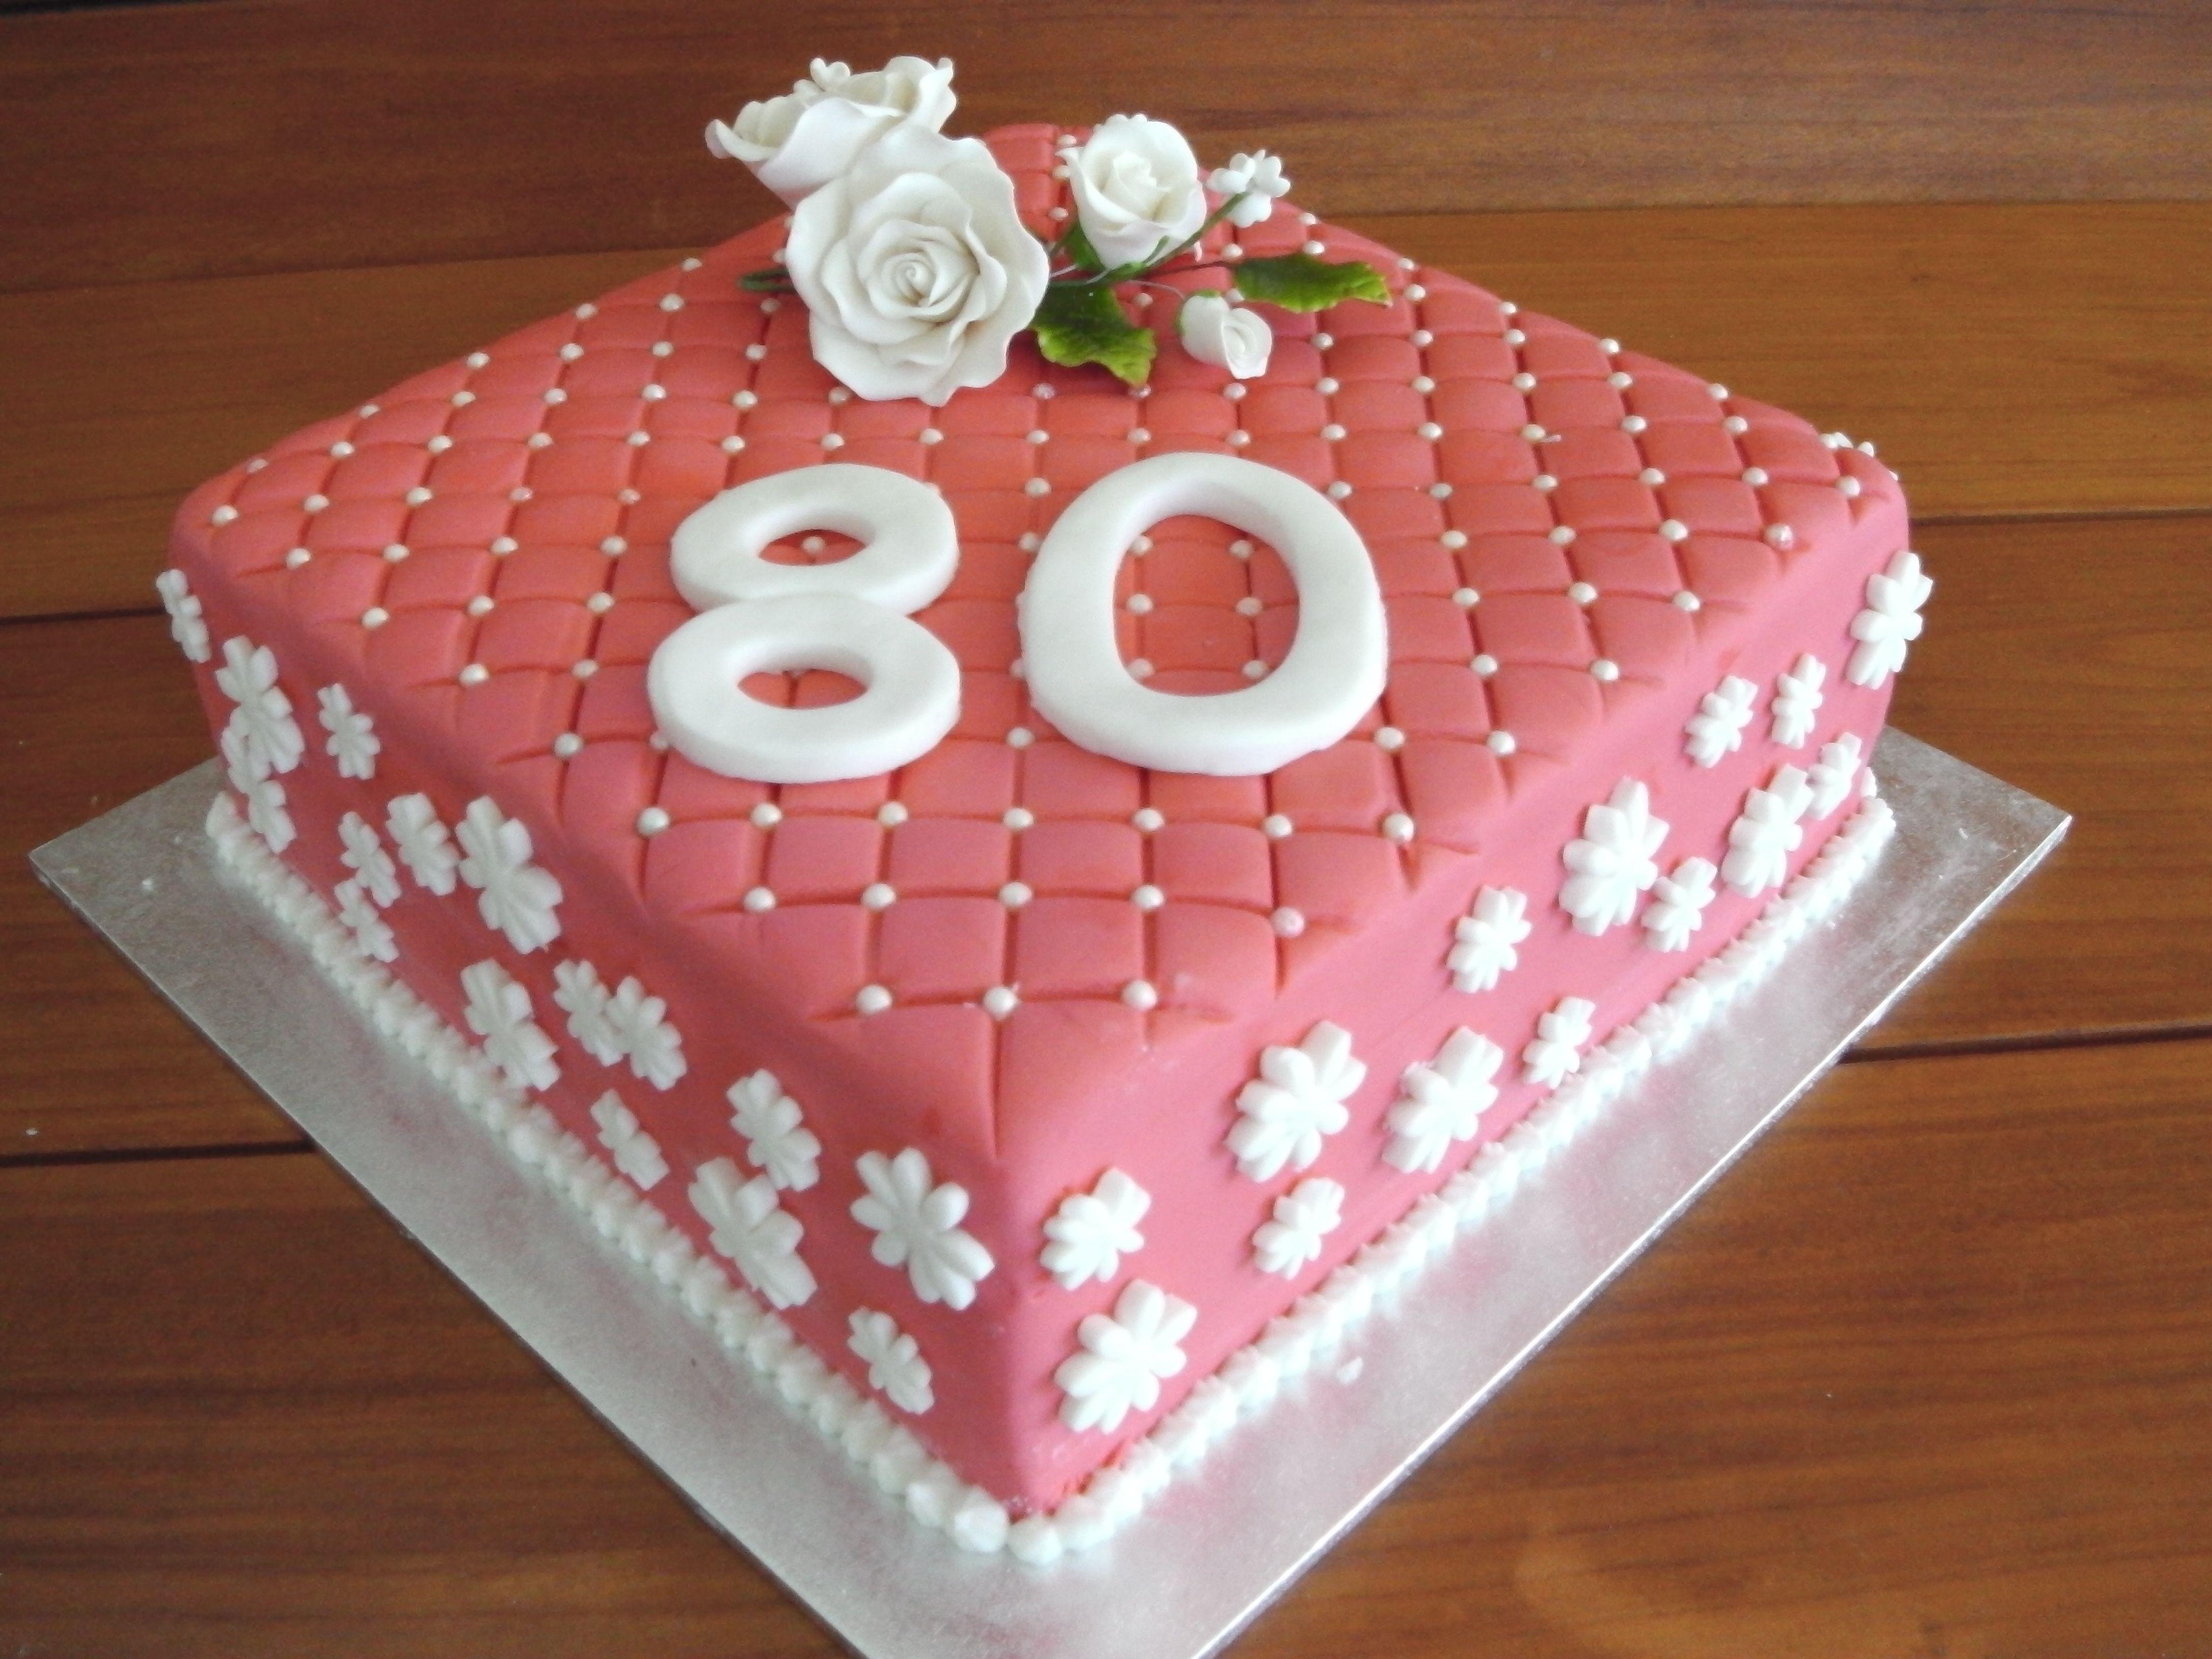 Happy 80th Birthday Mary Traditional rich fruit cake Bakin